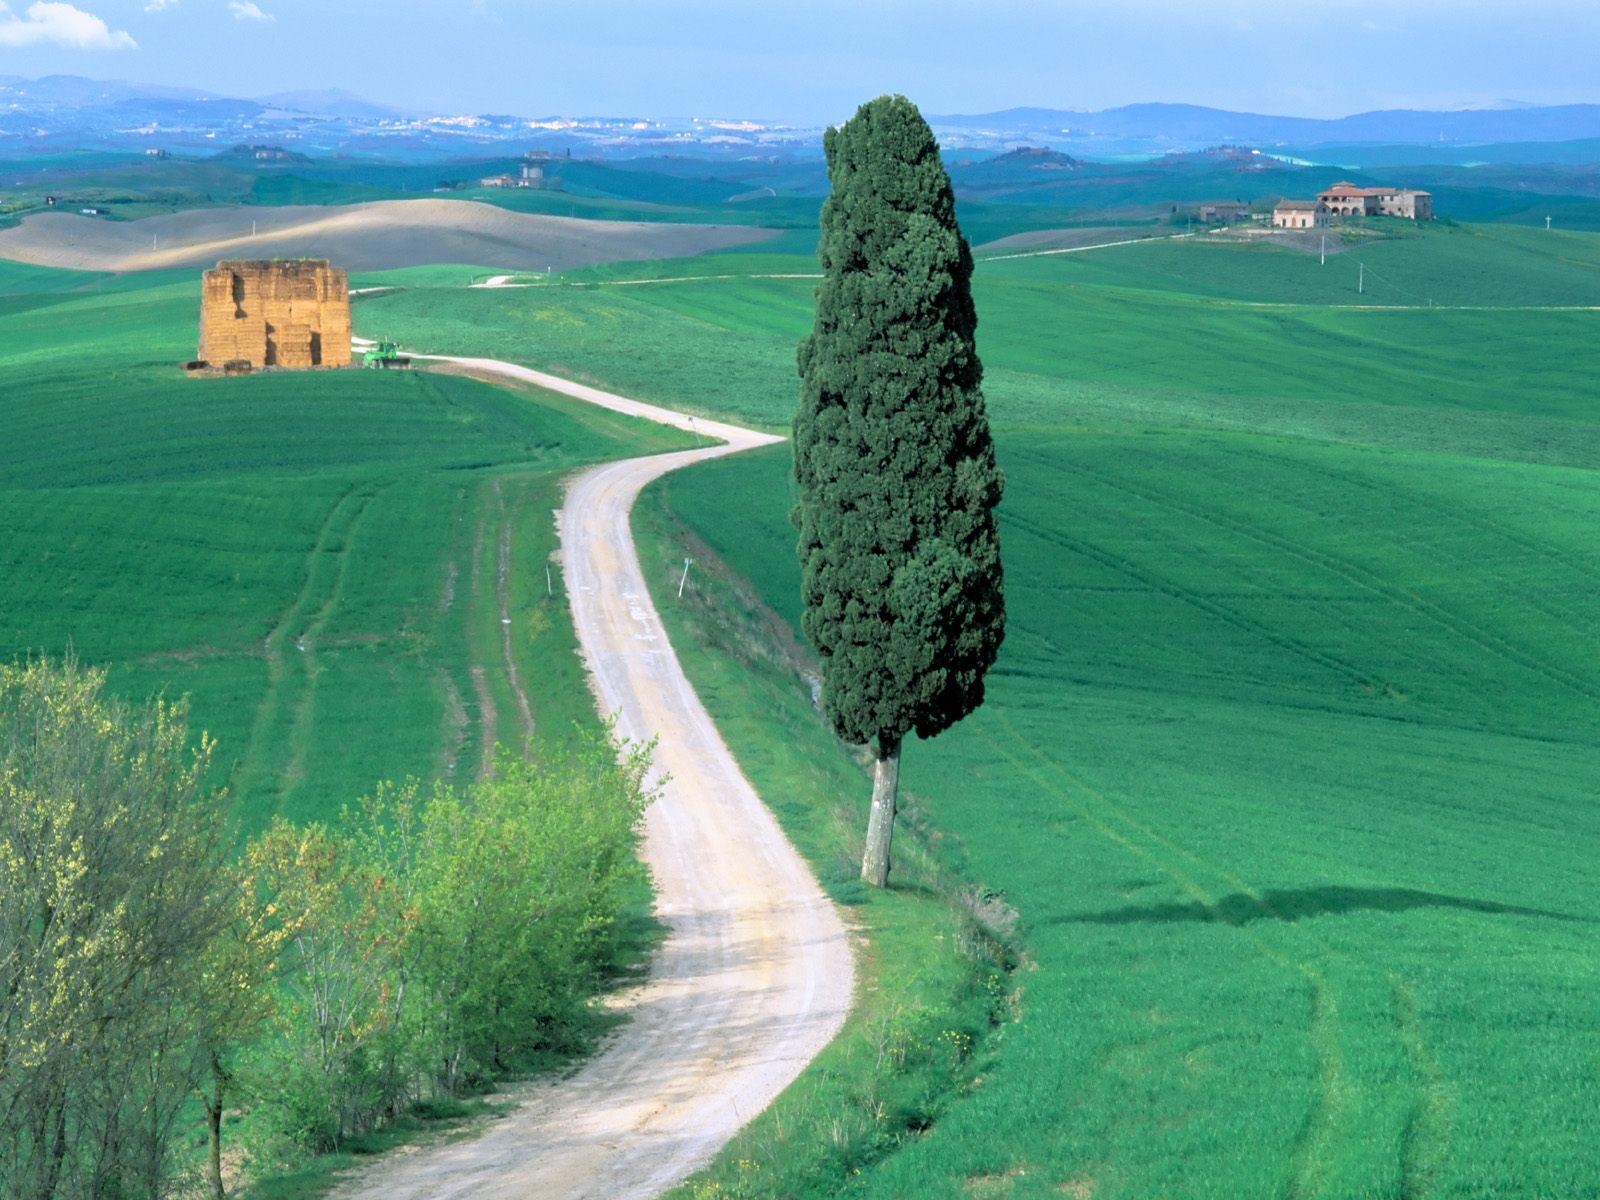 http://1.bp.blogspot.com/-9OEkyqGxSUU/Tcp3SVdHdtI/AAAAAAAACW0/Q6QTQVTKPTM/s1600/Country+Road%252C+Tuscany%252C+Italy.jpg